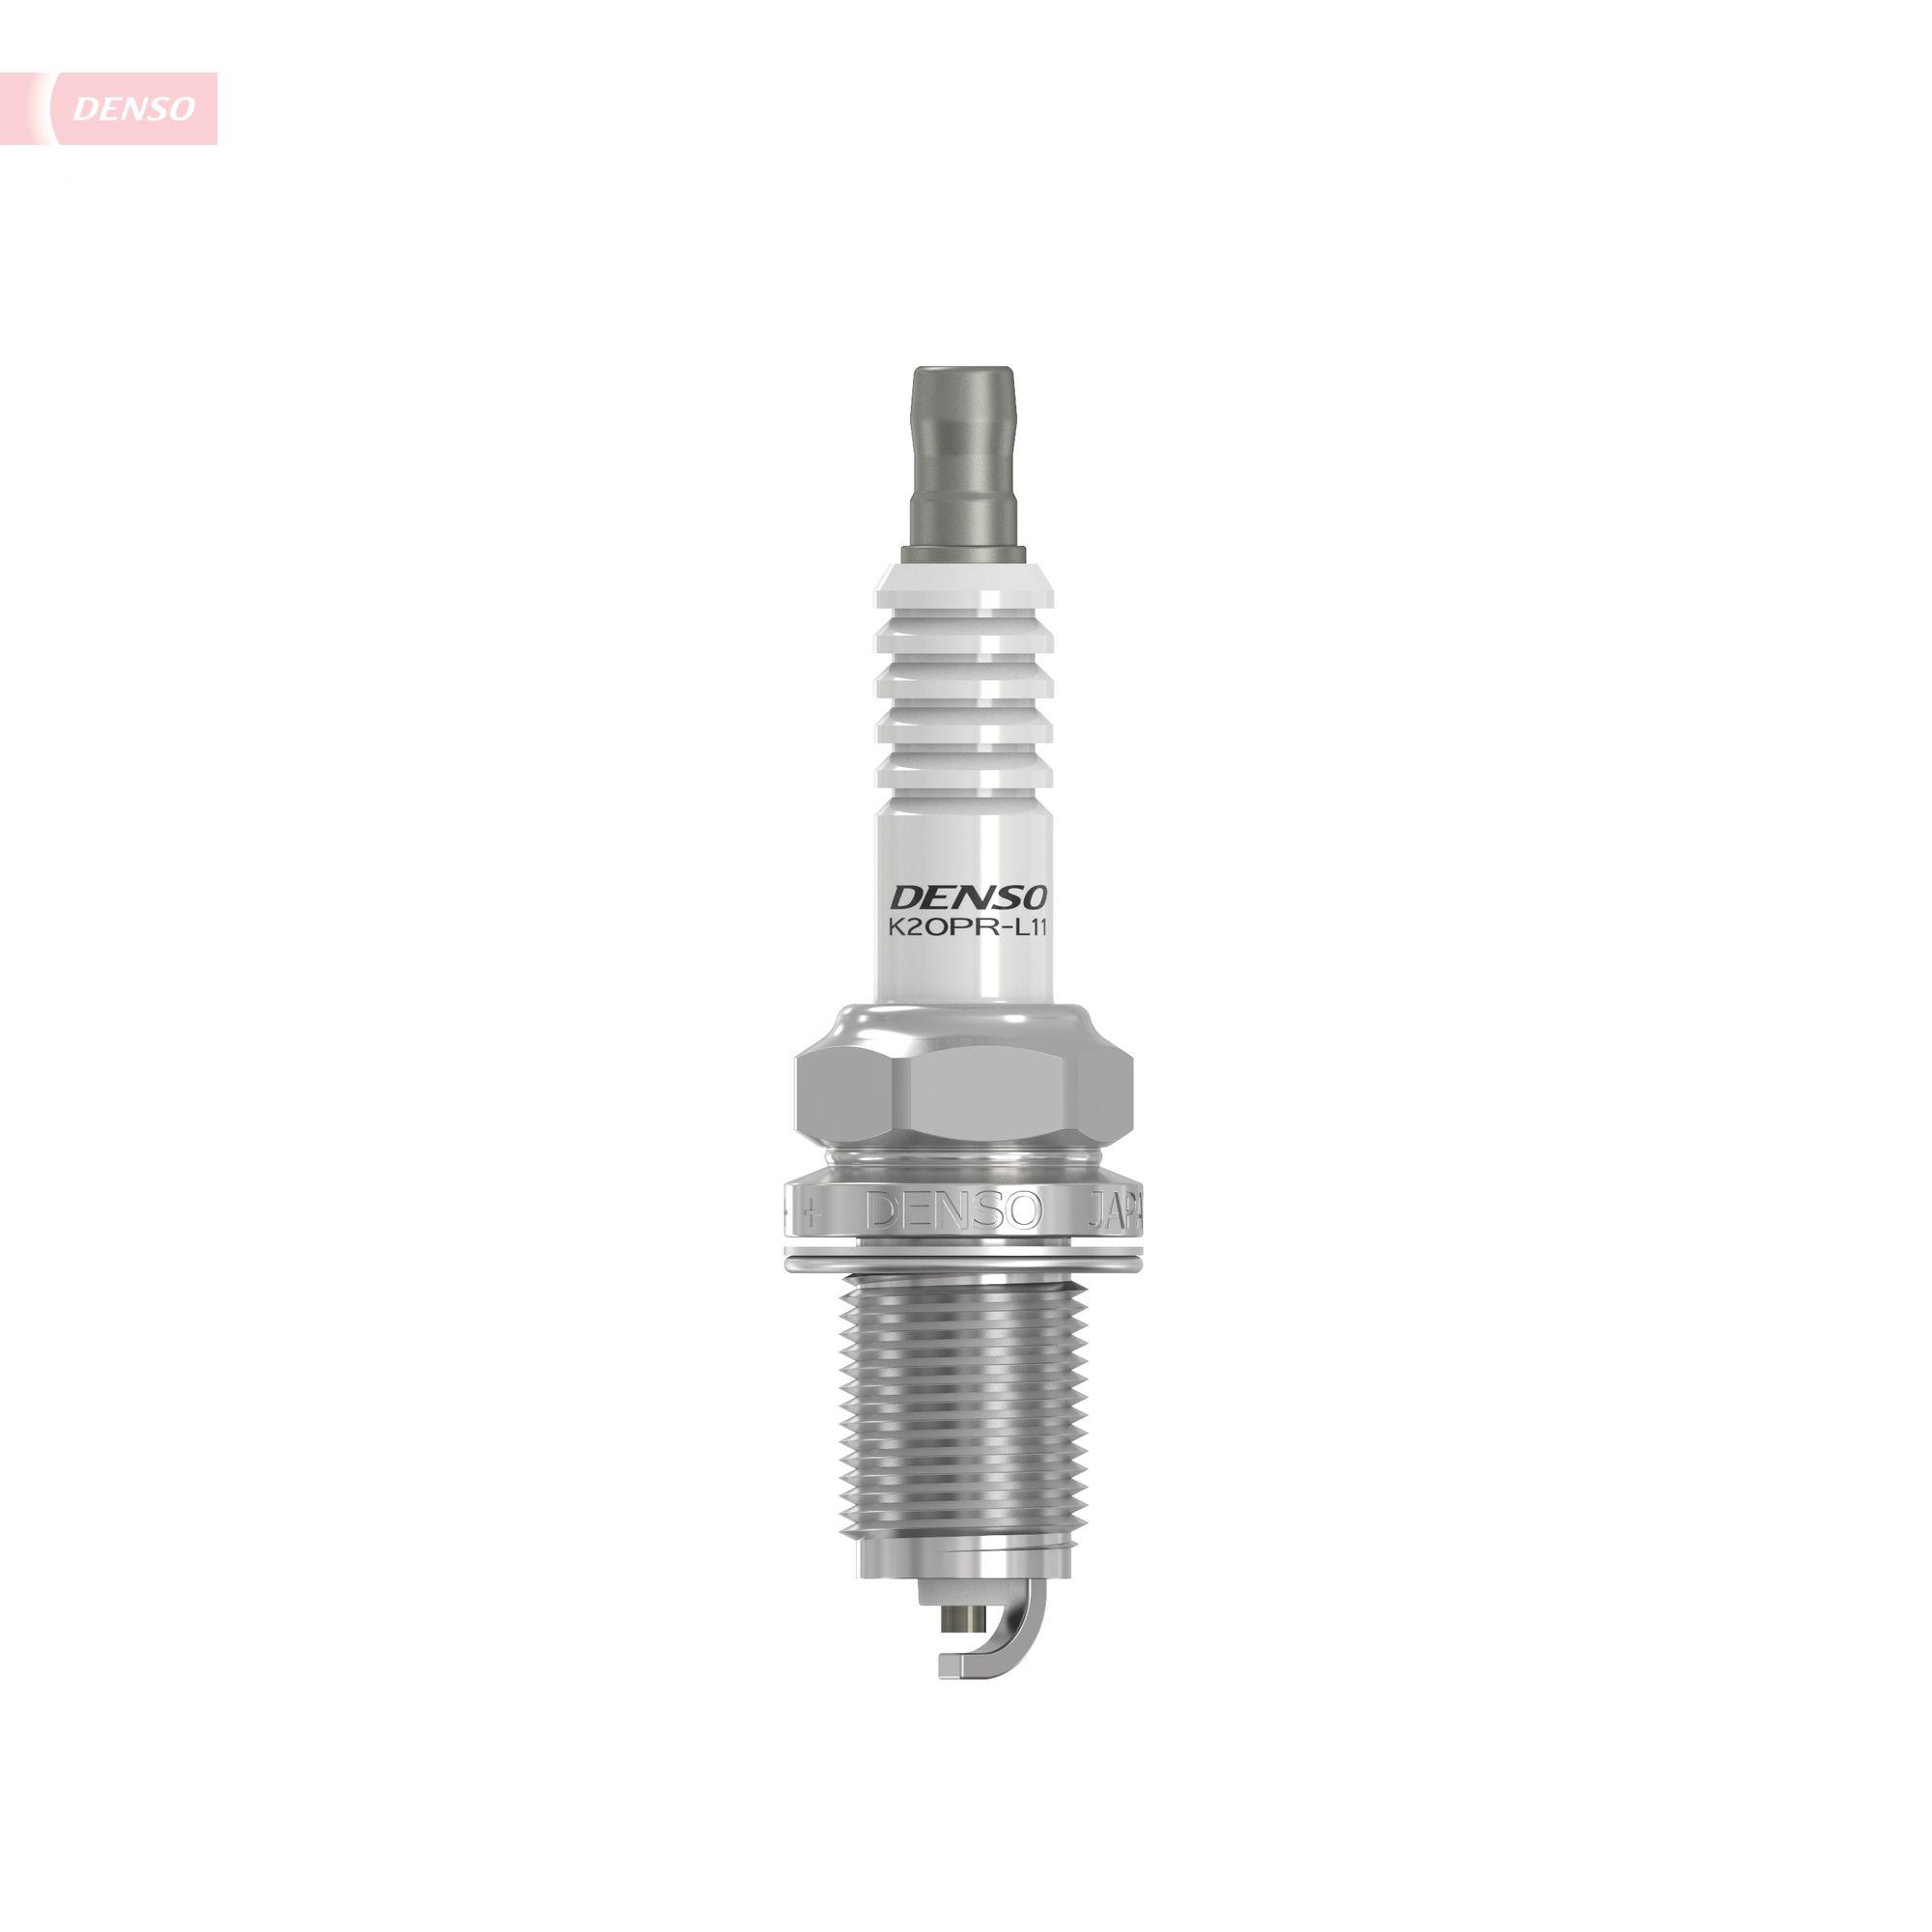 Spark Plug DENSO 3144 rating